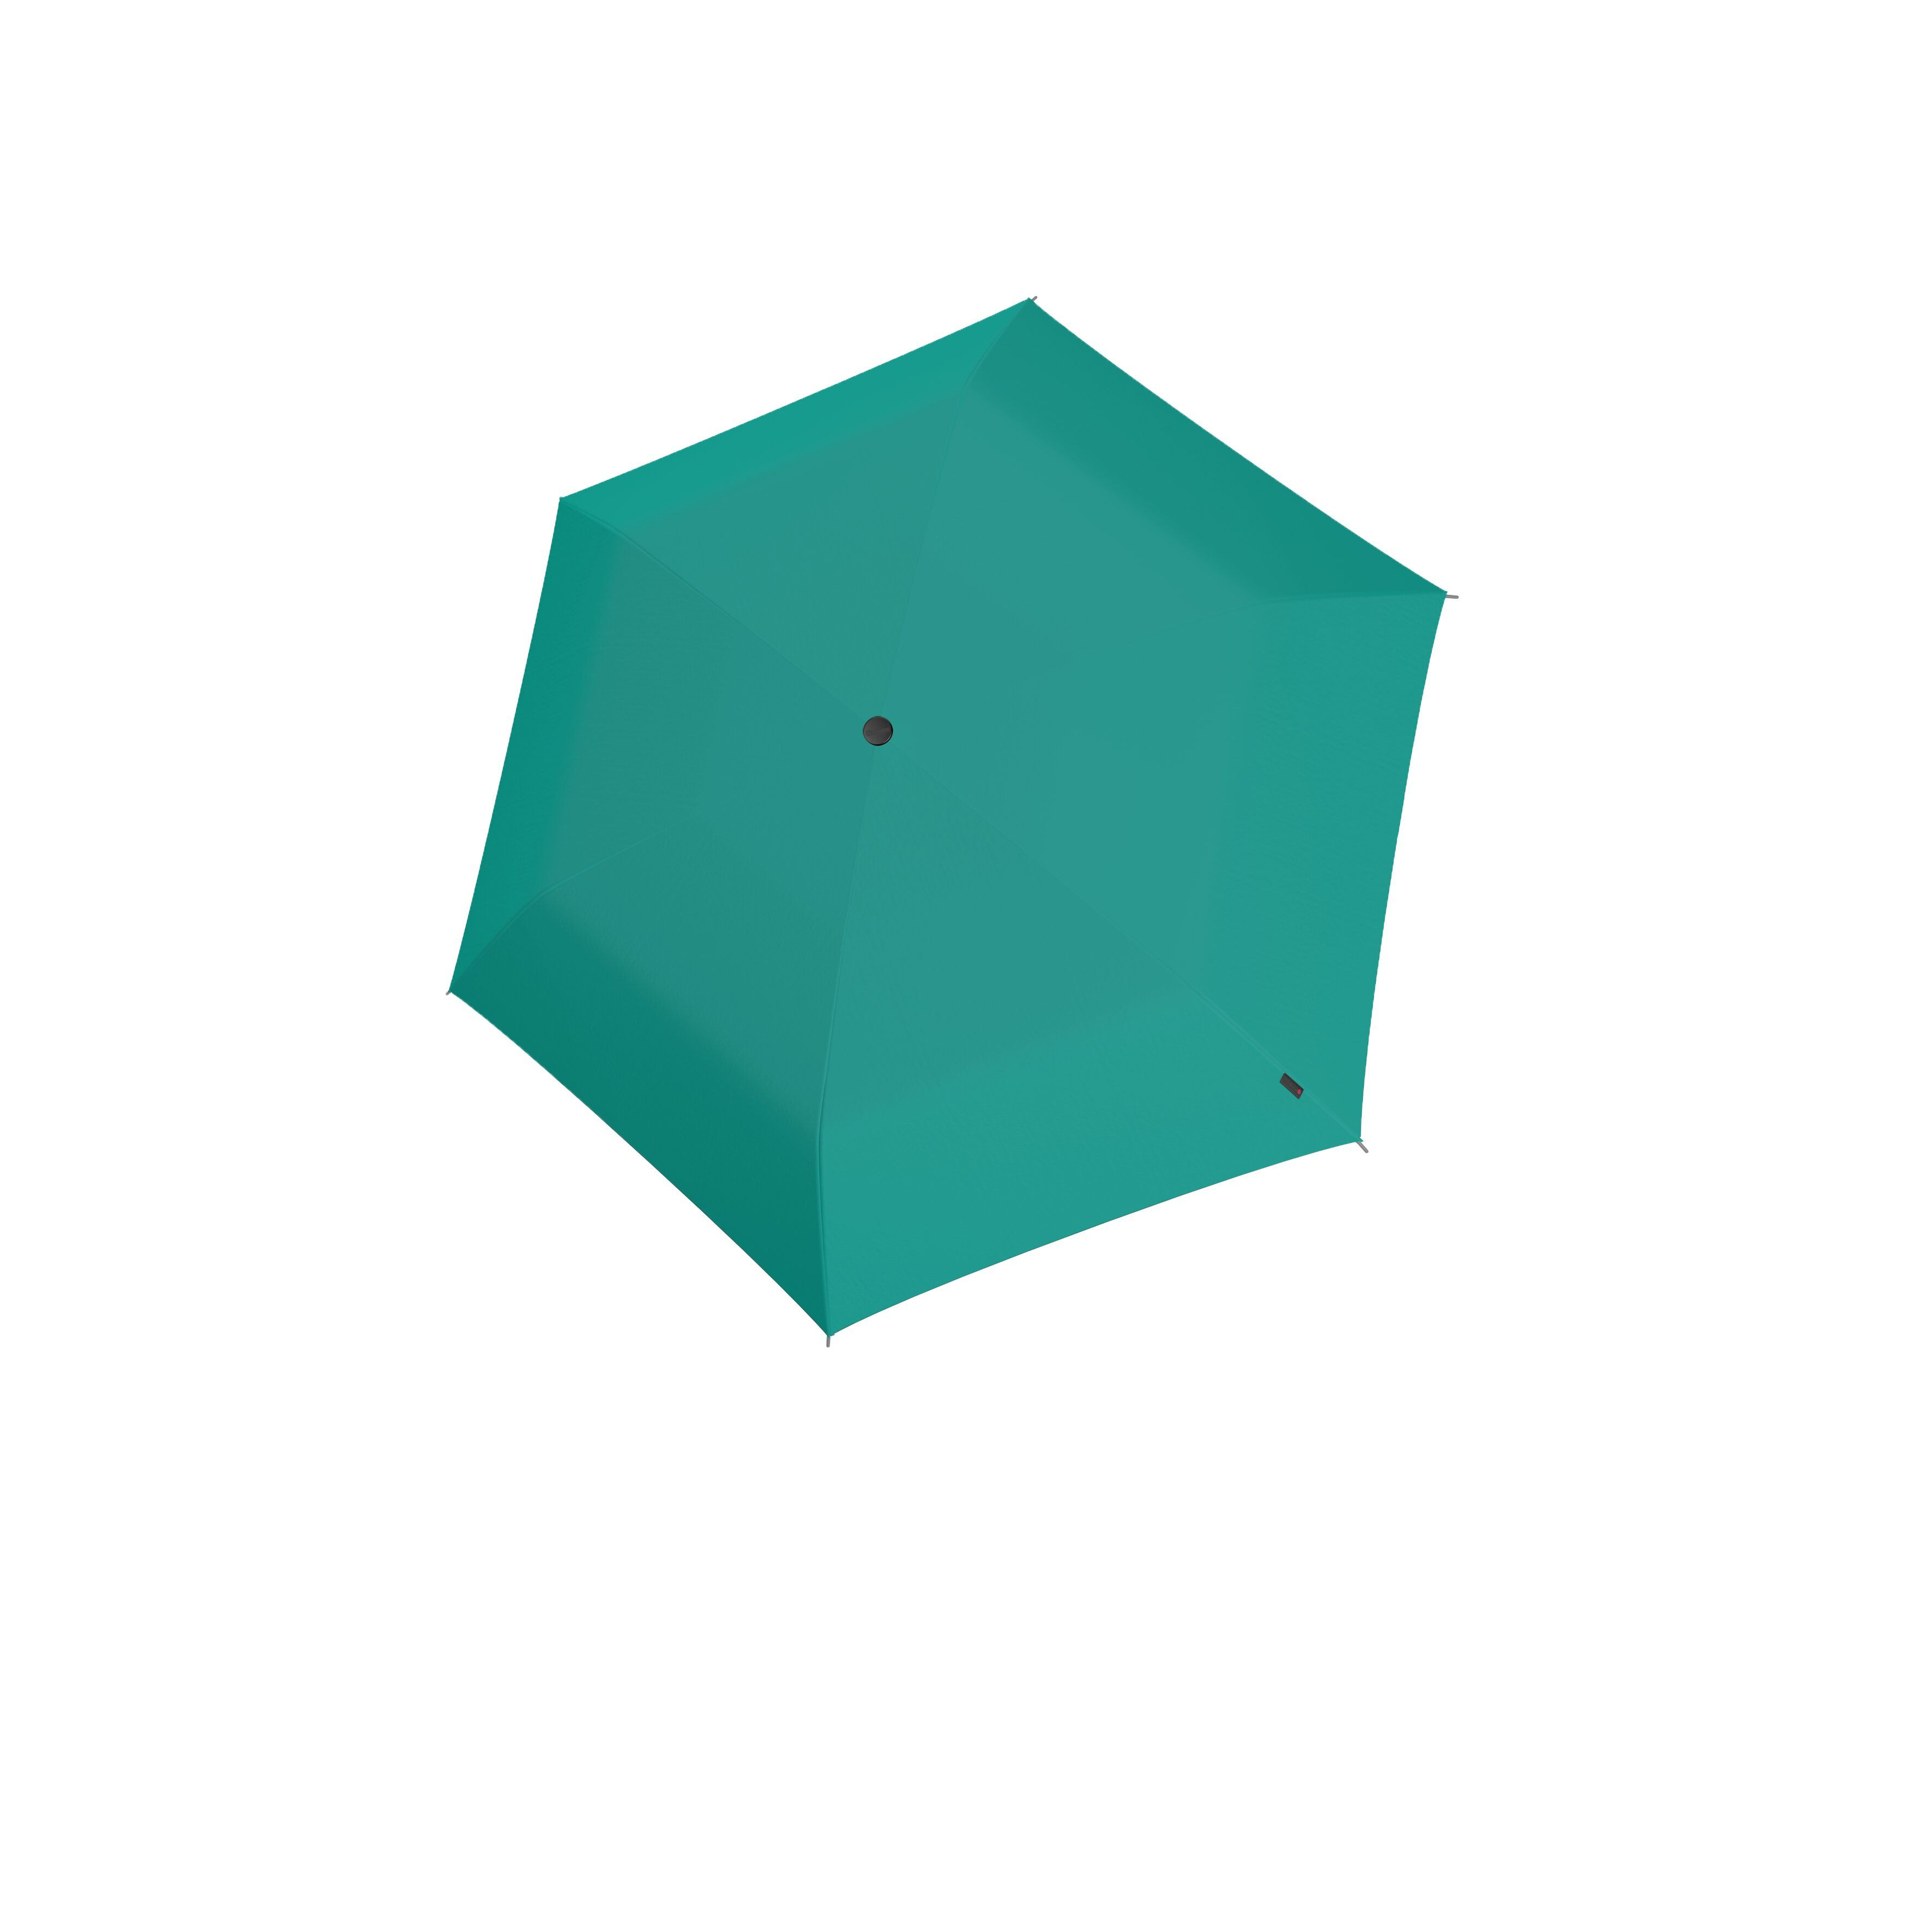 Knirps Umbrella AS.050 slim small manual - photo 2